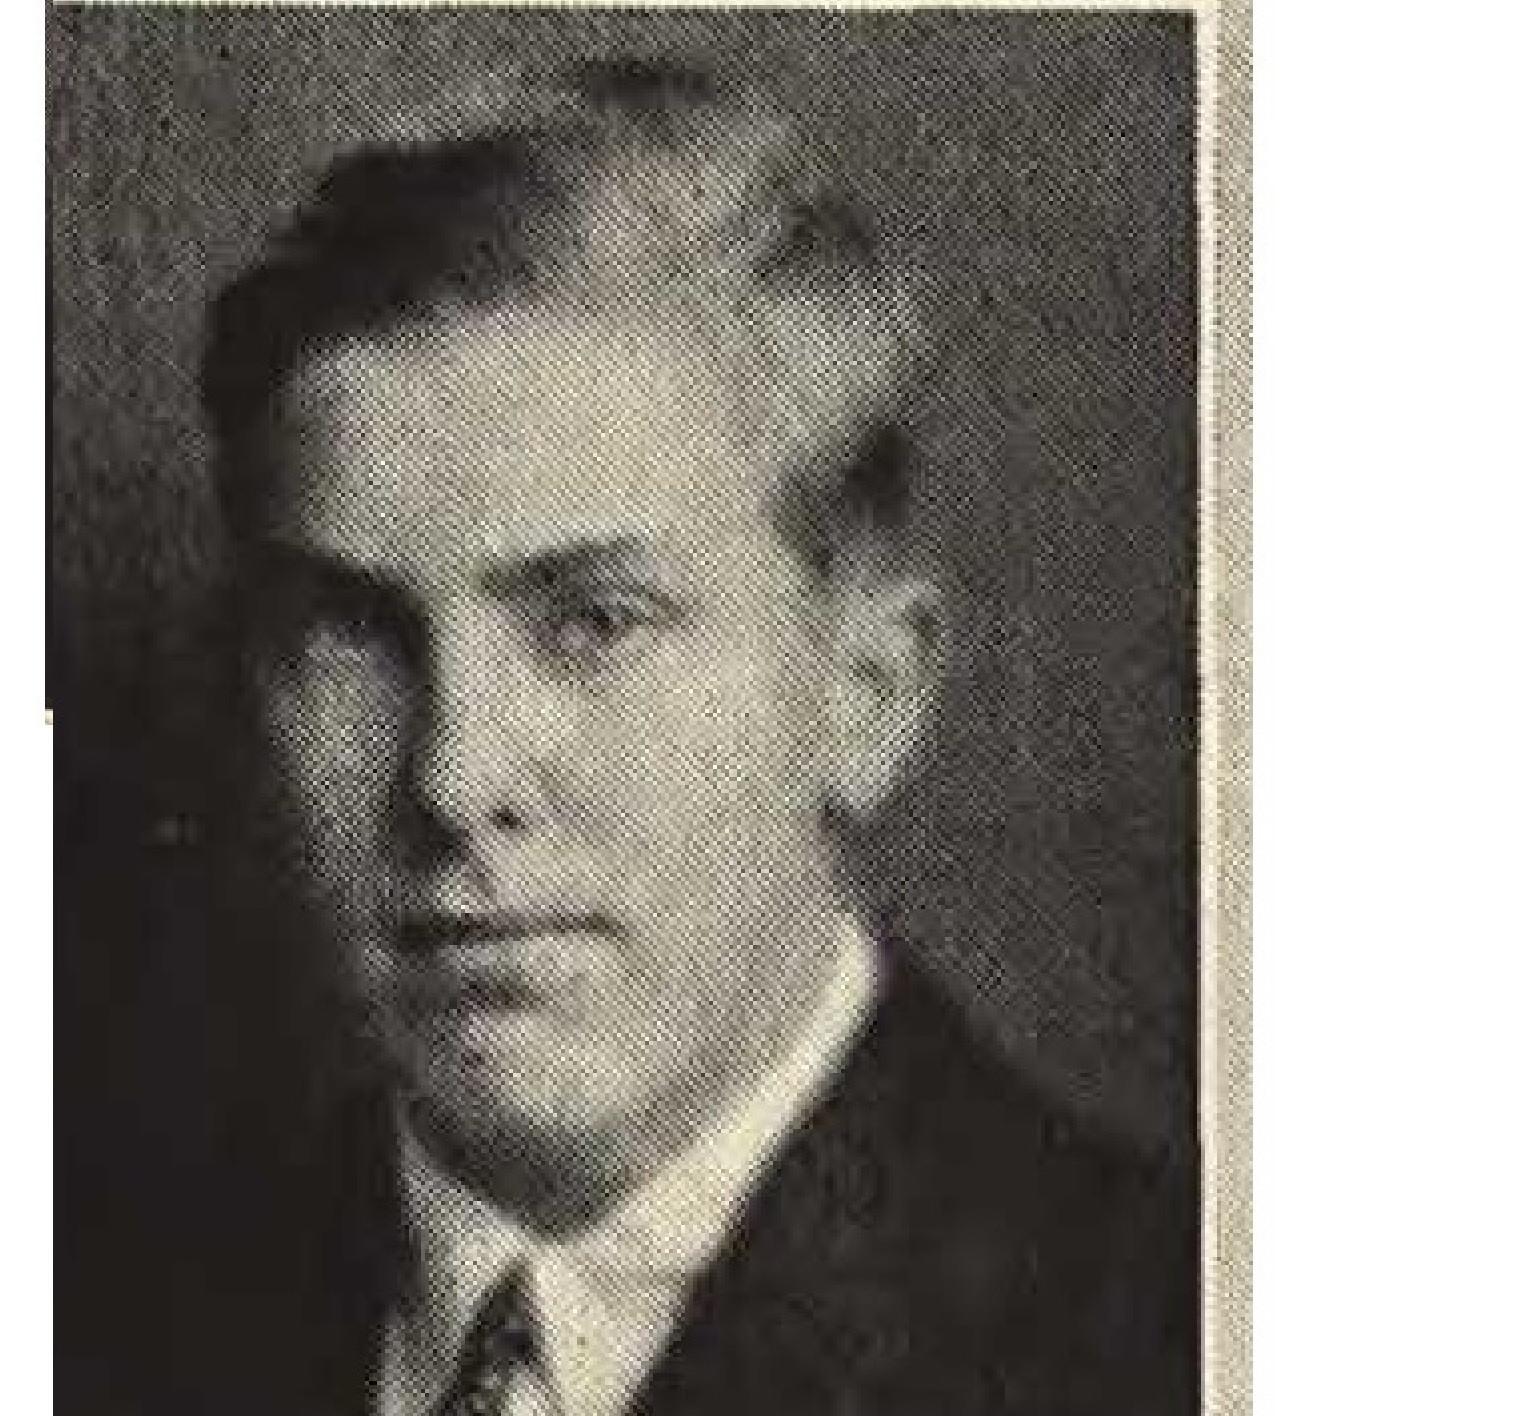 Alec Lundgren